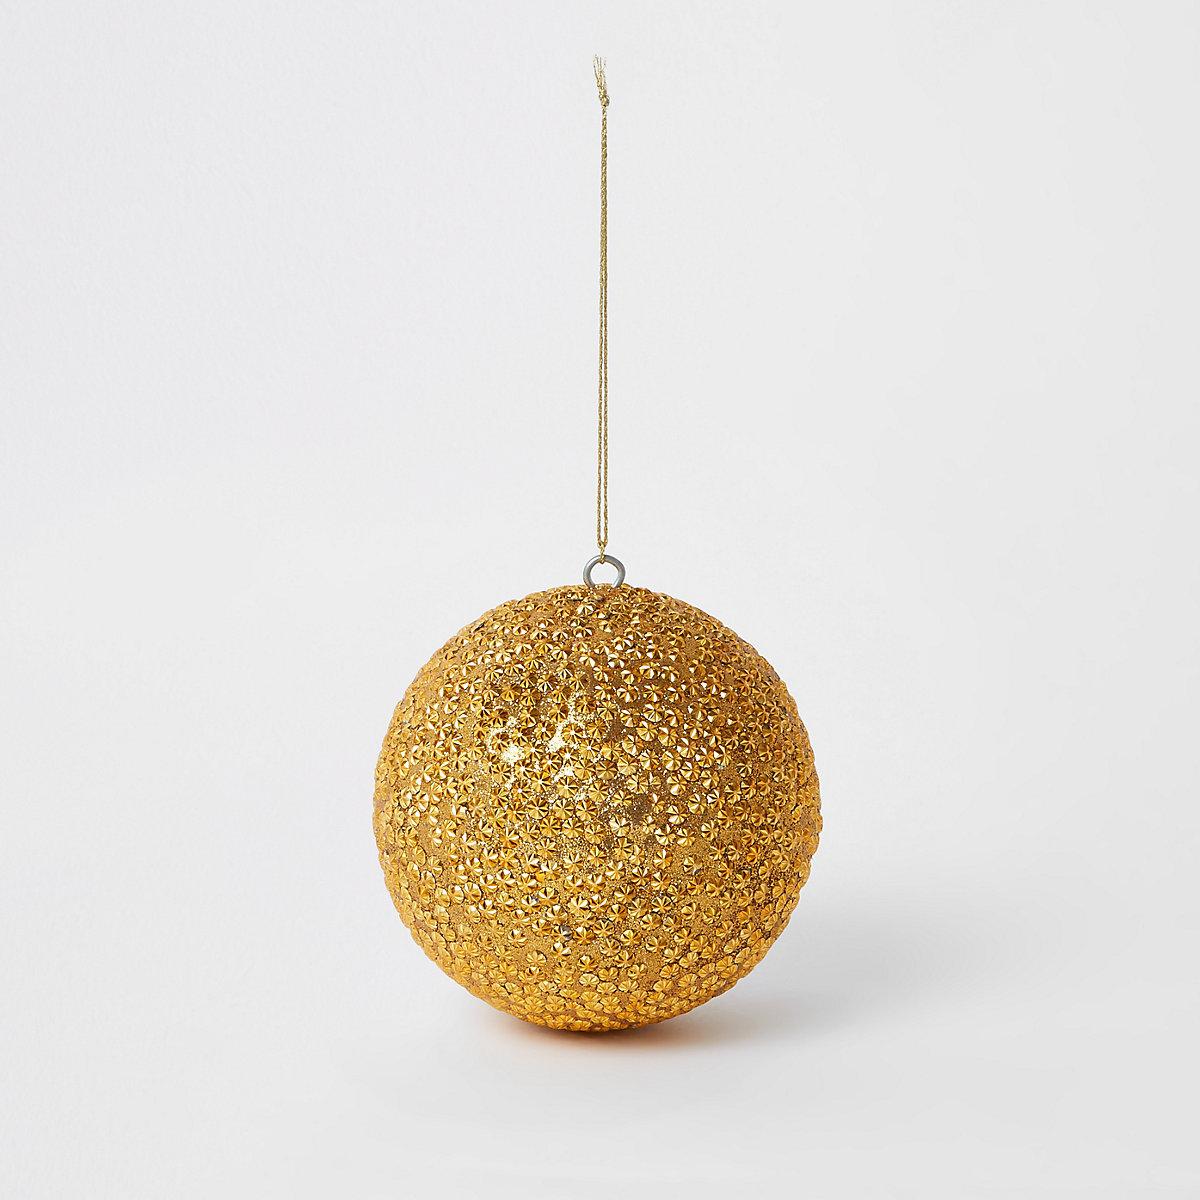 Grosse boule de Noël dorée brillante